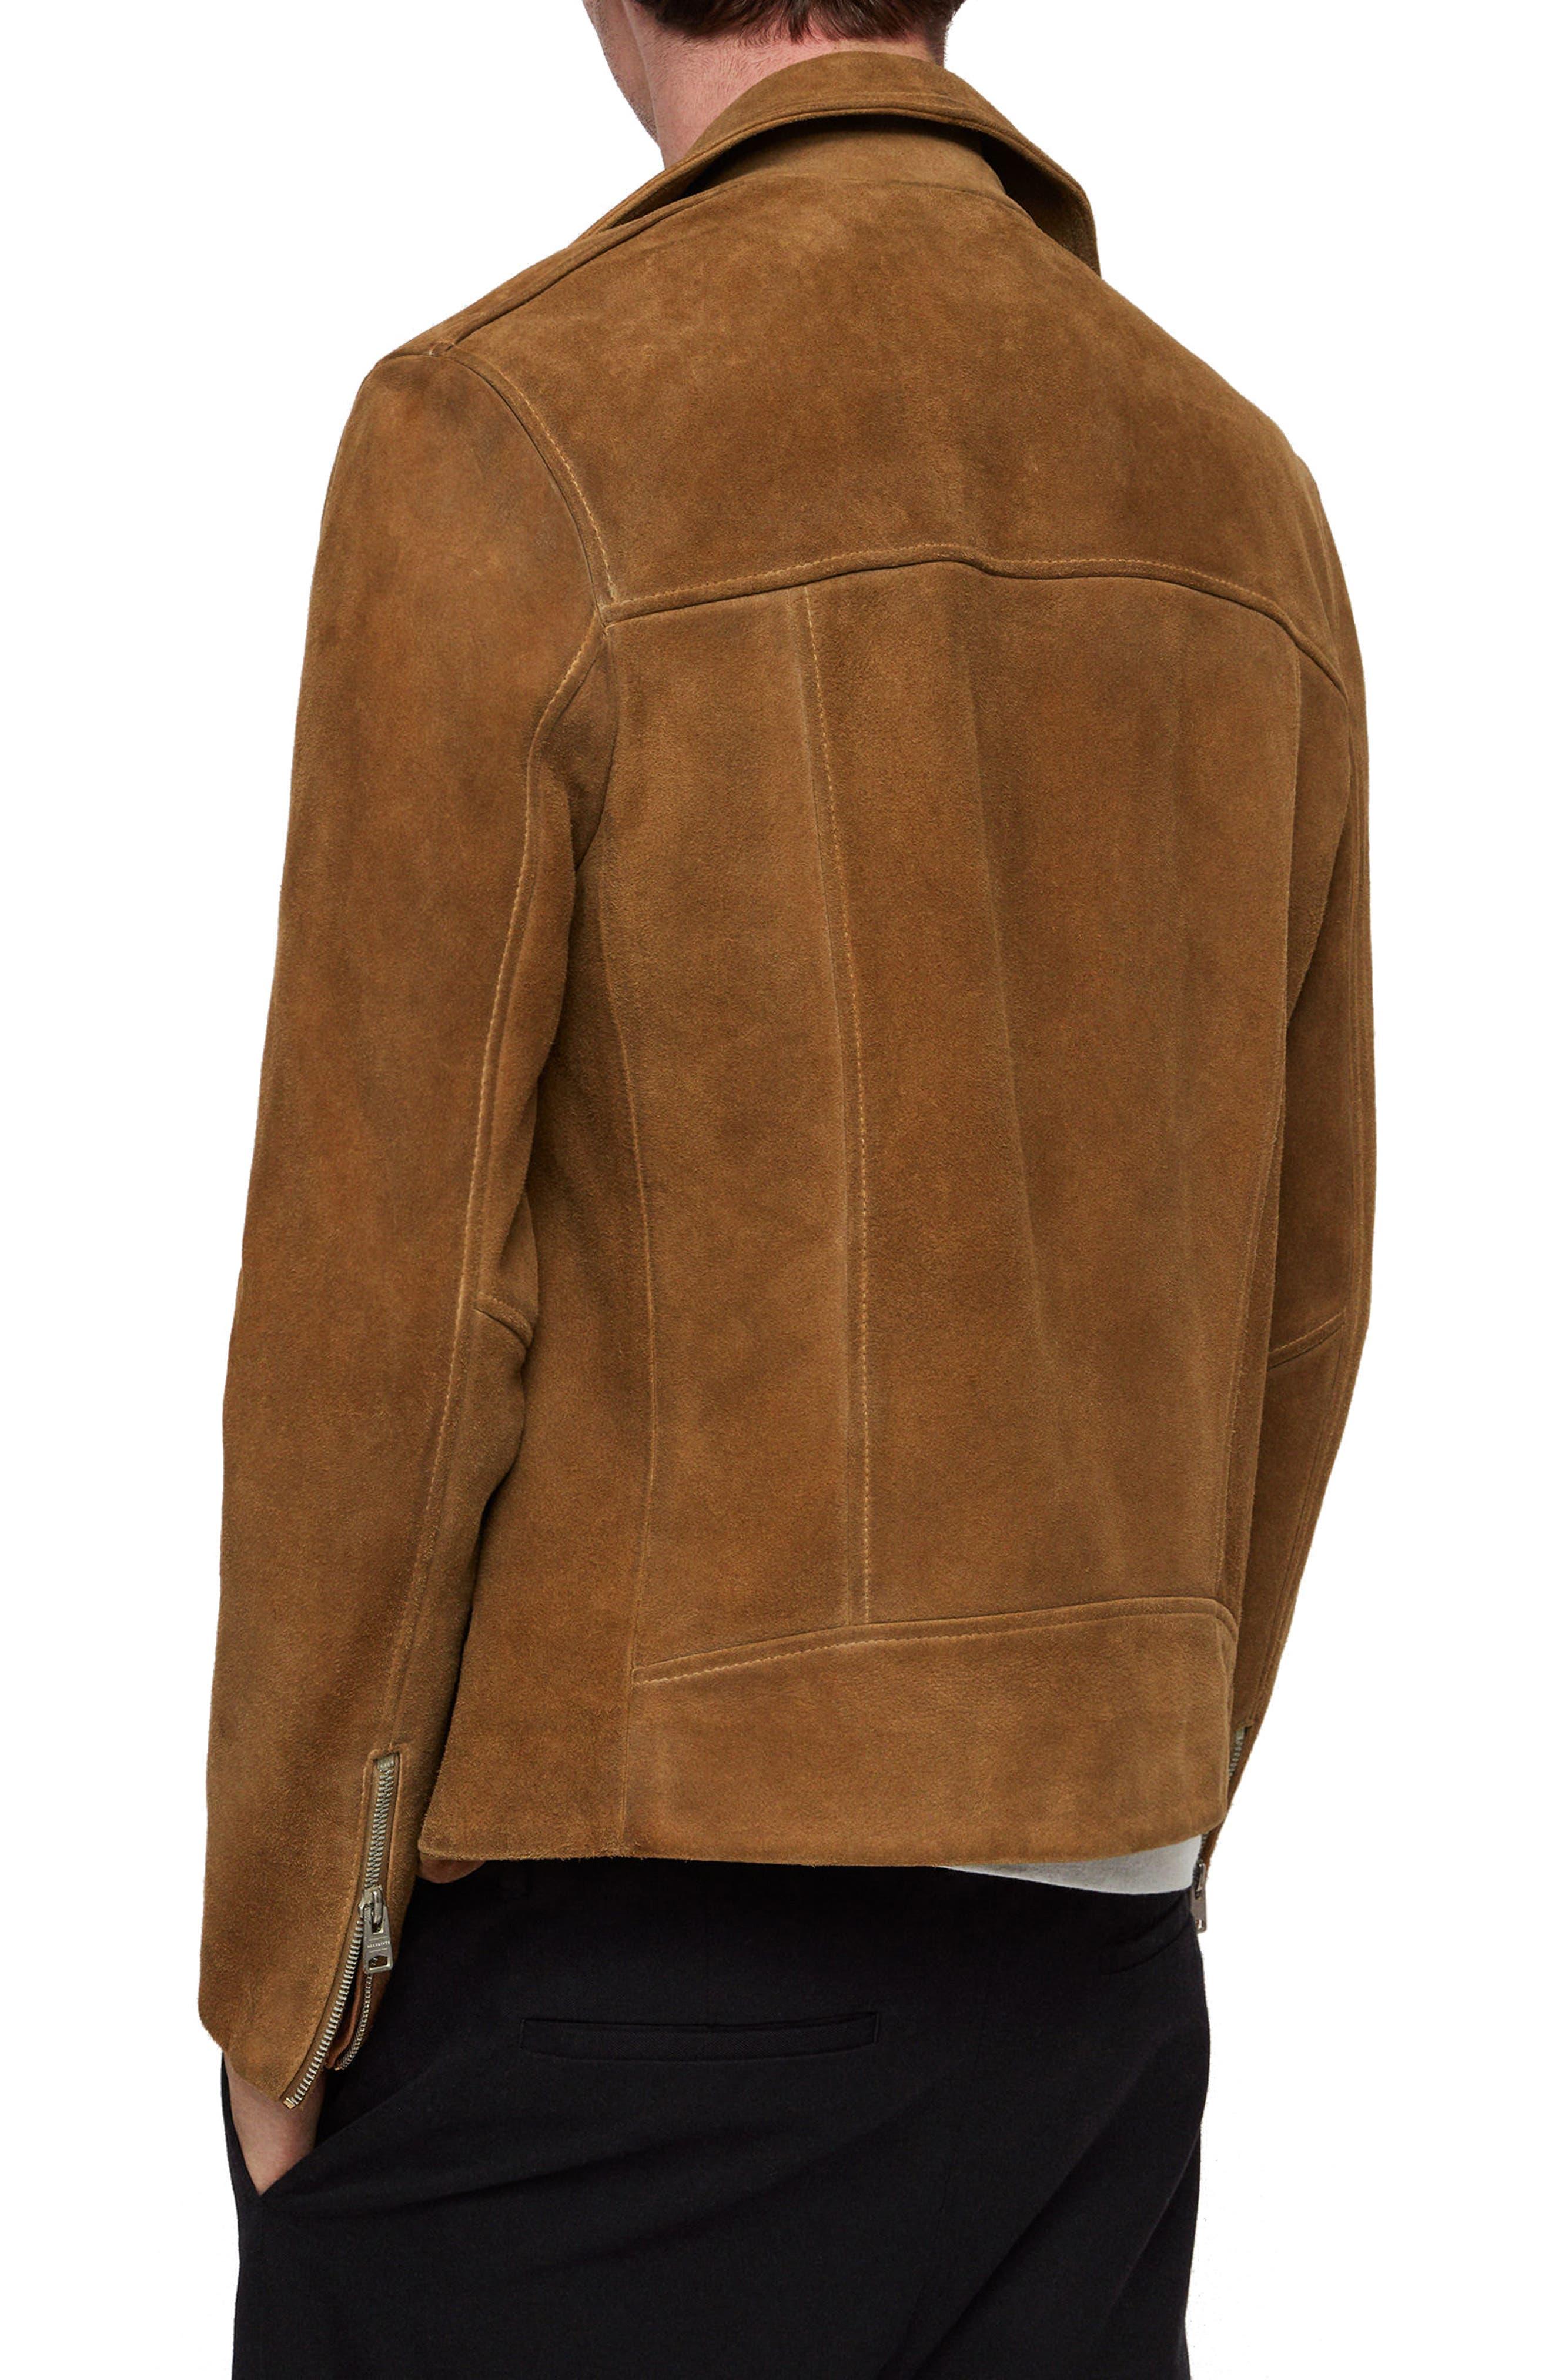 Judd Slim Fit Leather Biker Jacket,                             Alternate thumbnail 2, color,                             219